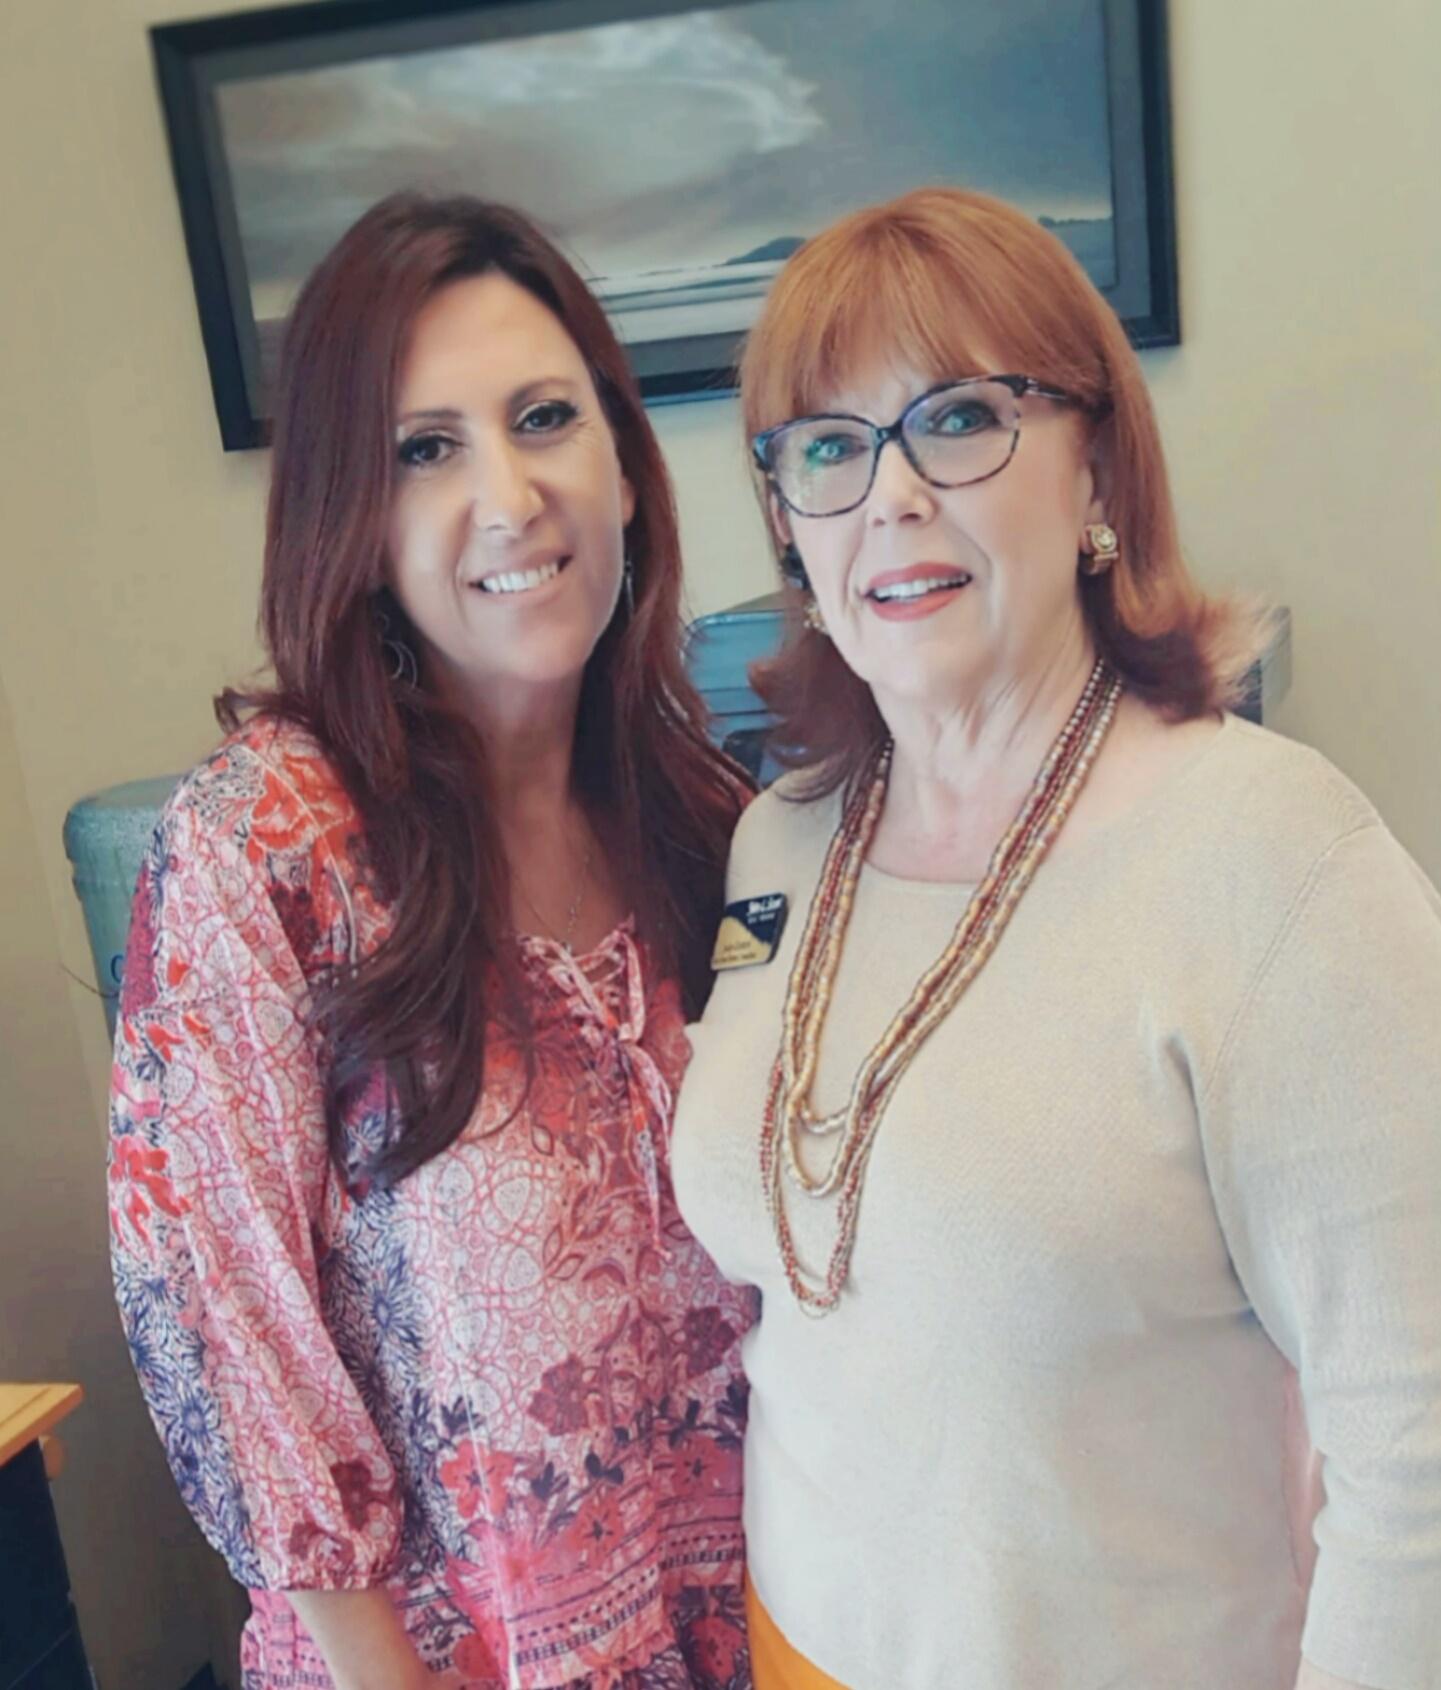 Ilana Yagudayev, American Family Insurance  in Bothell, meet the Owner Ilana Yagudayev